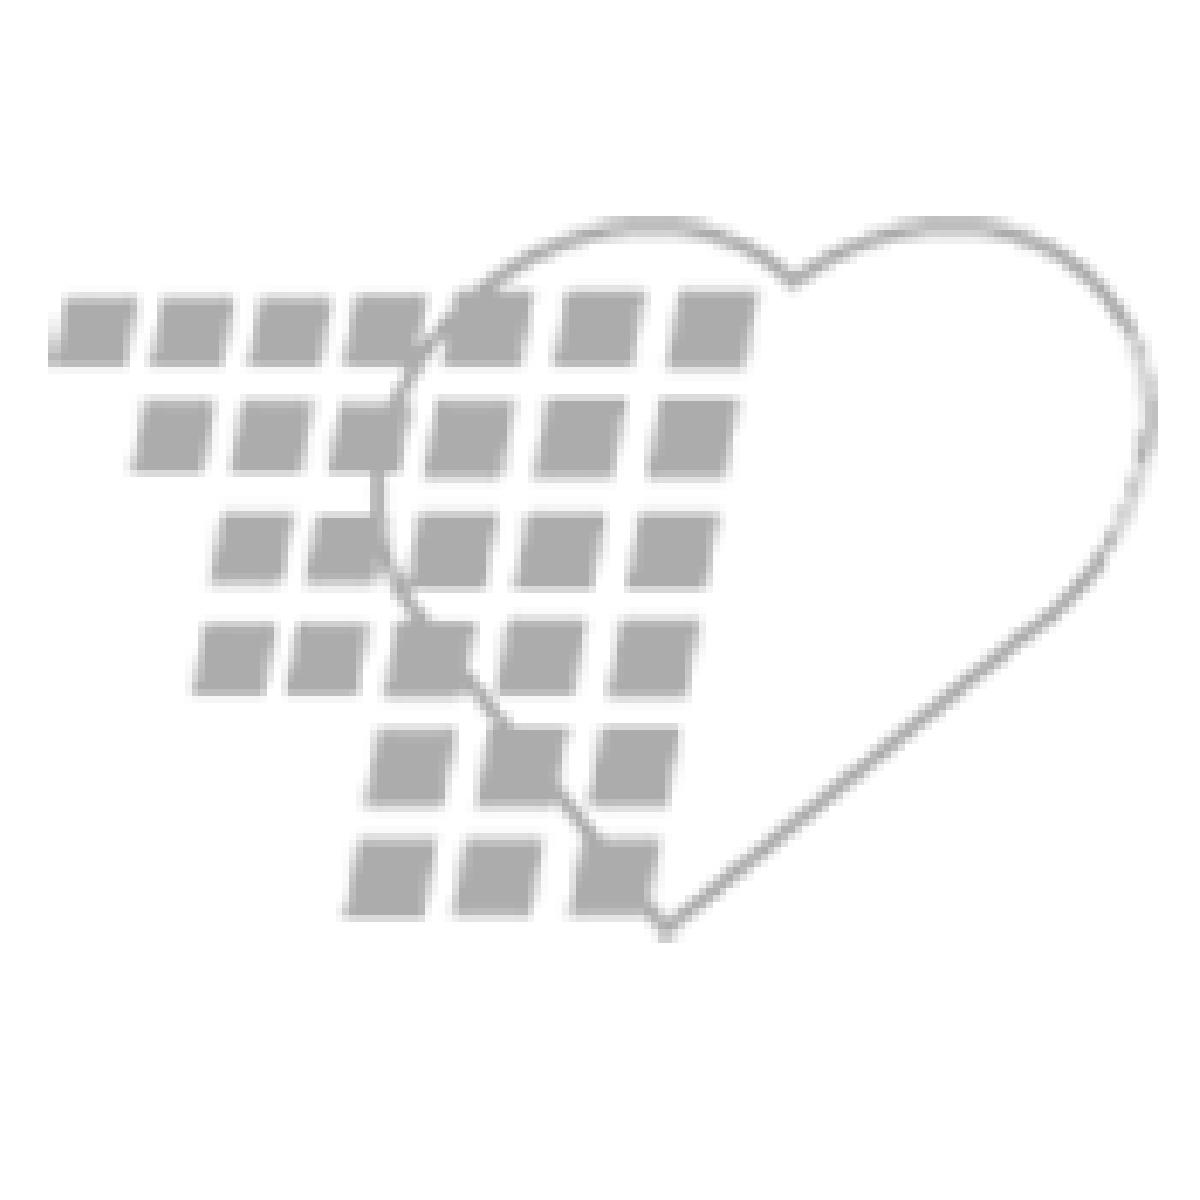 06-93-3010 Demo Dose® Furosemid Lasx 10 mg/mL 2 mL